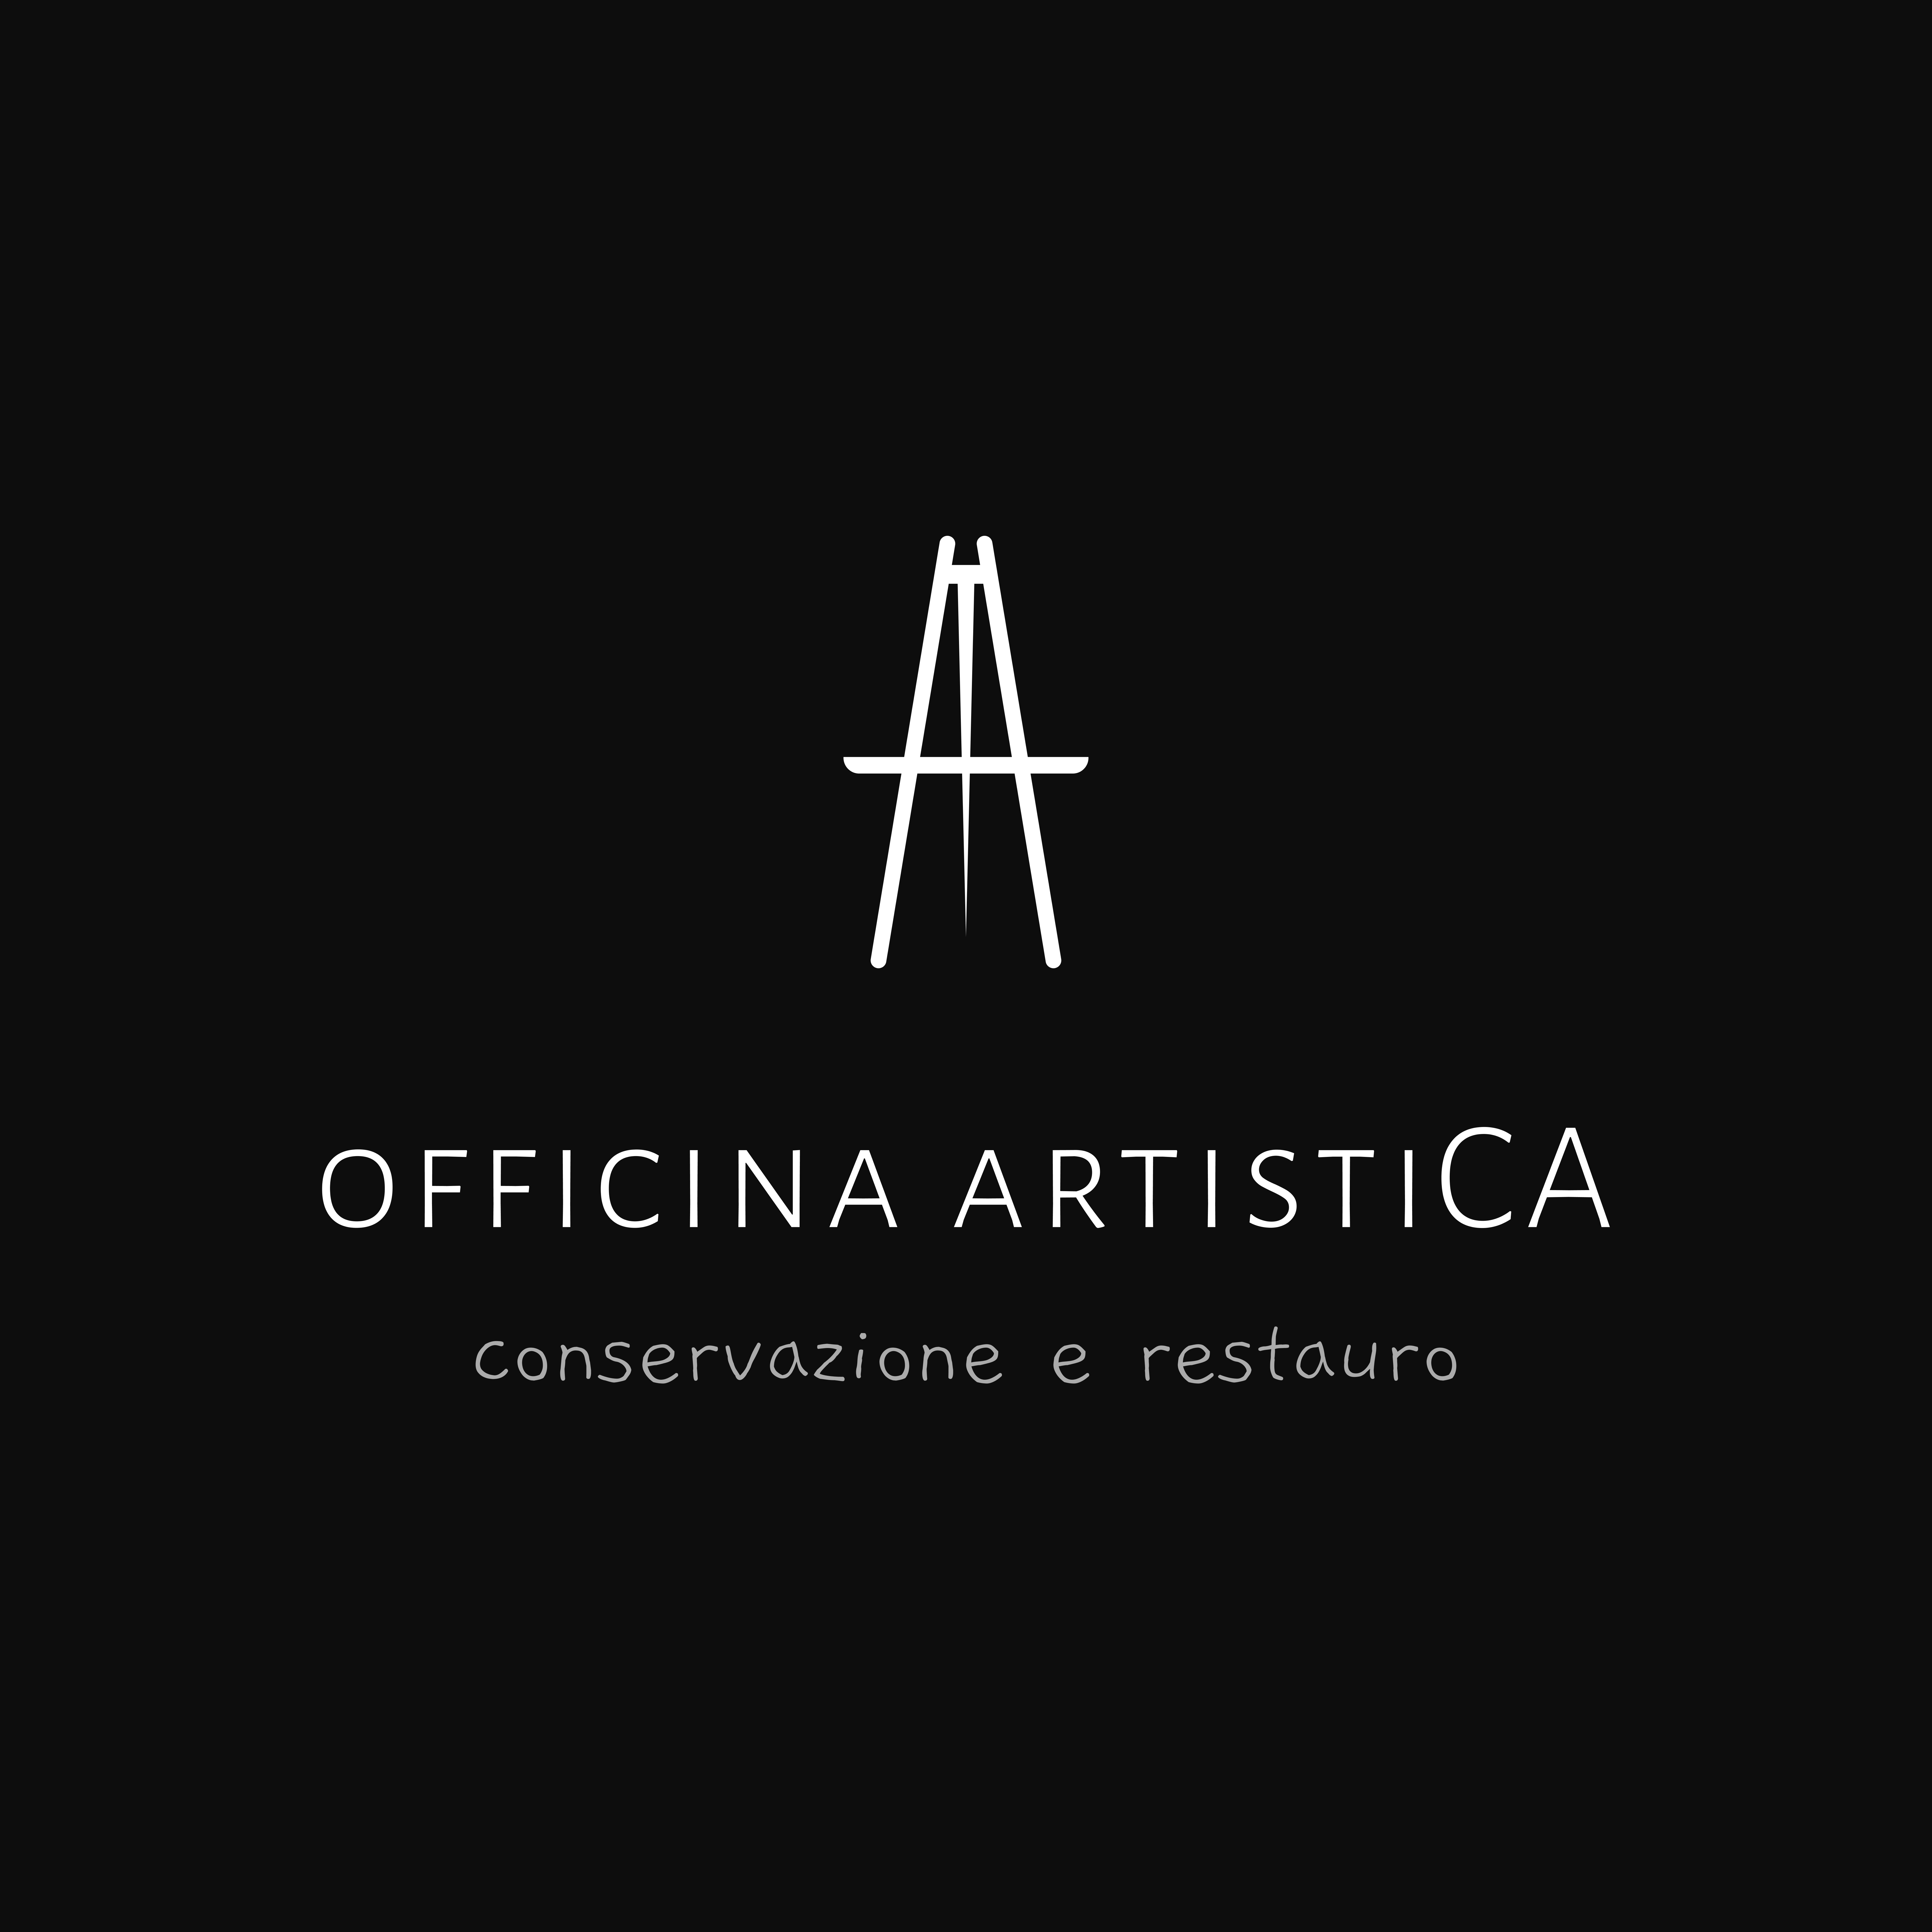 carlotta-corduas-restauratori-dei-dipinti-profile